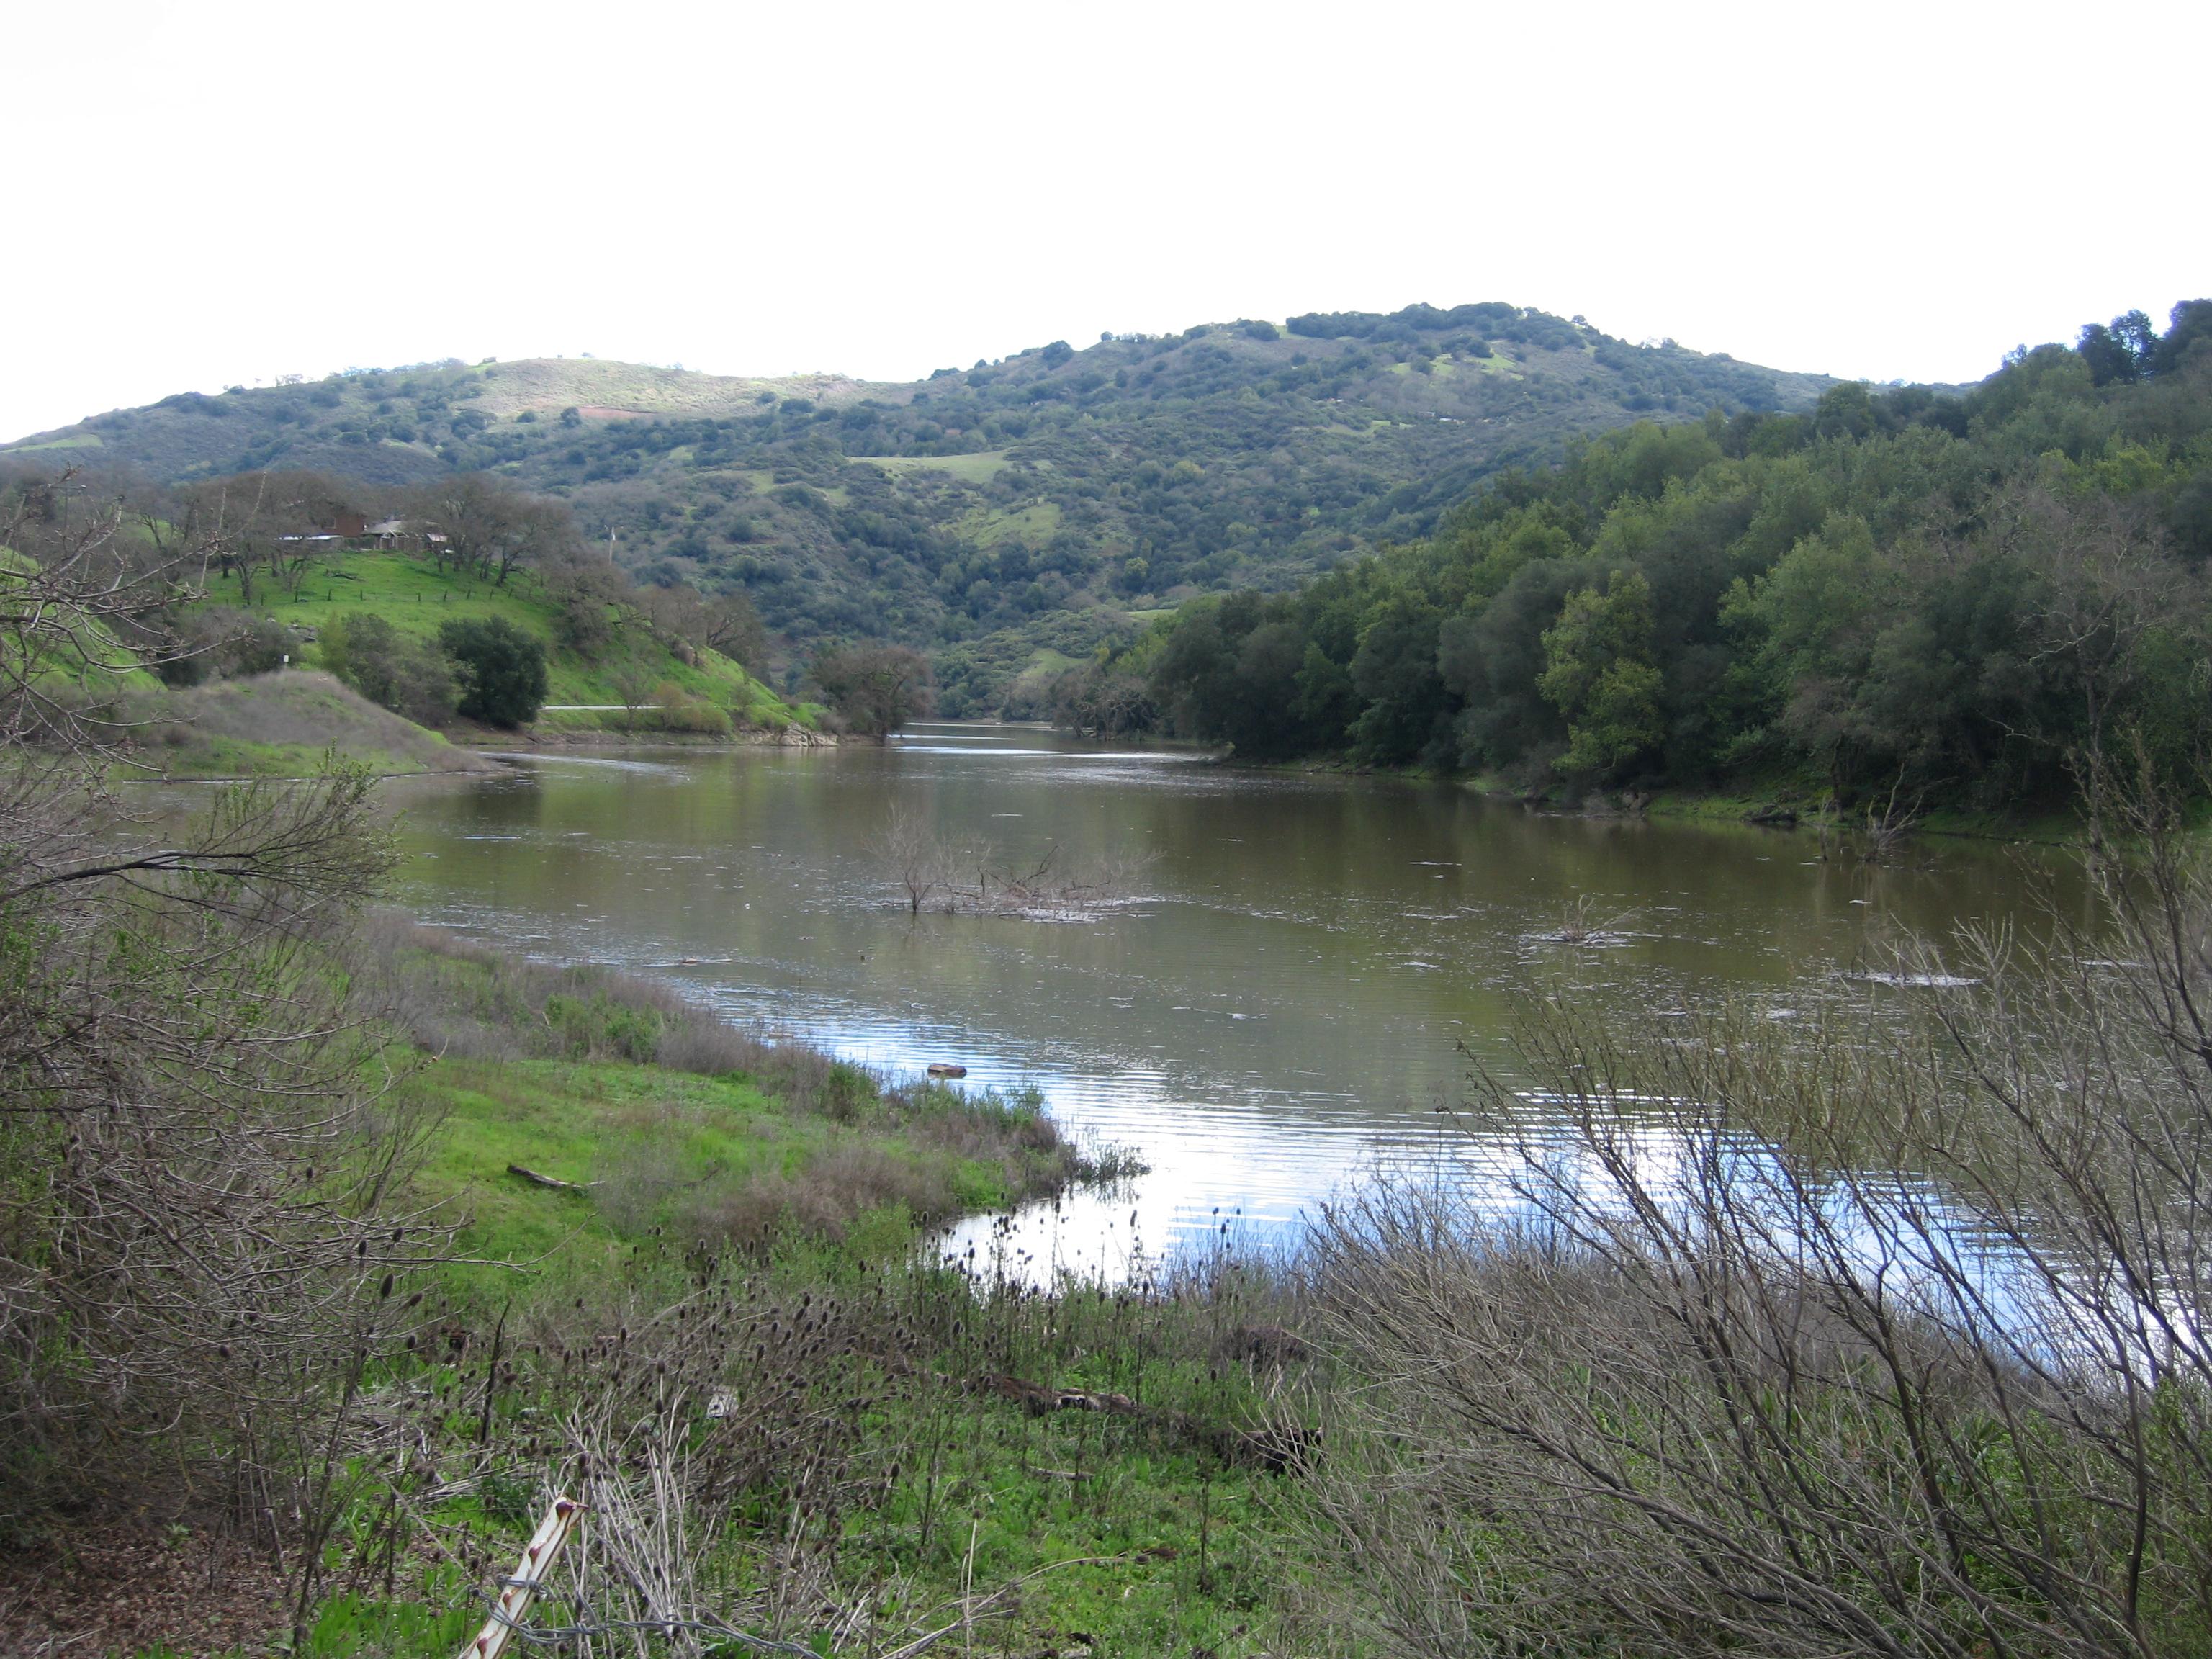 File:Jrb 20090305 Almaden Reservoir New Almaden San Jose CA 001.JPG